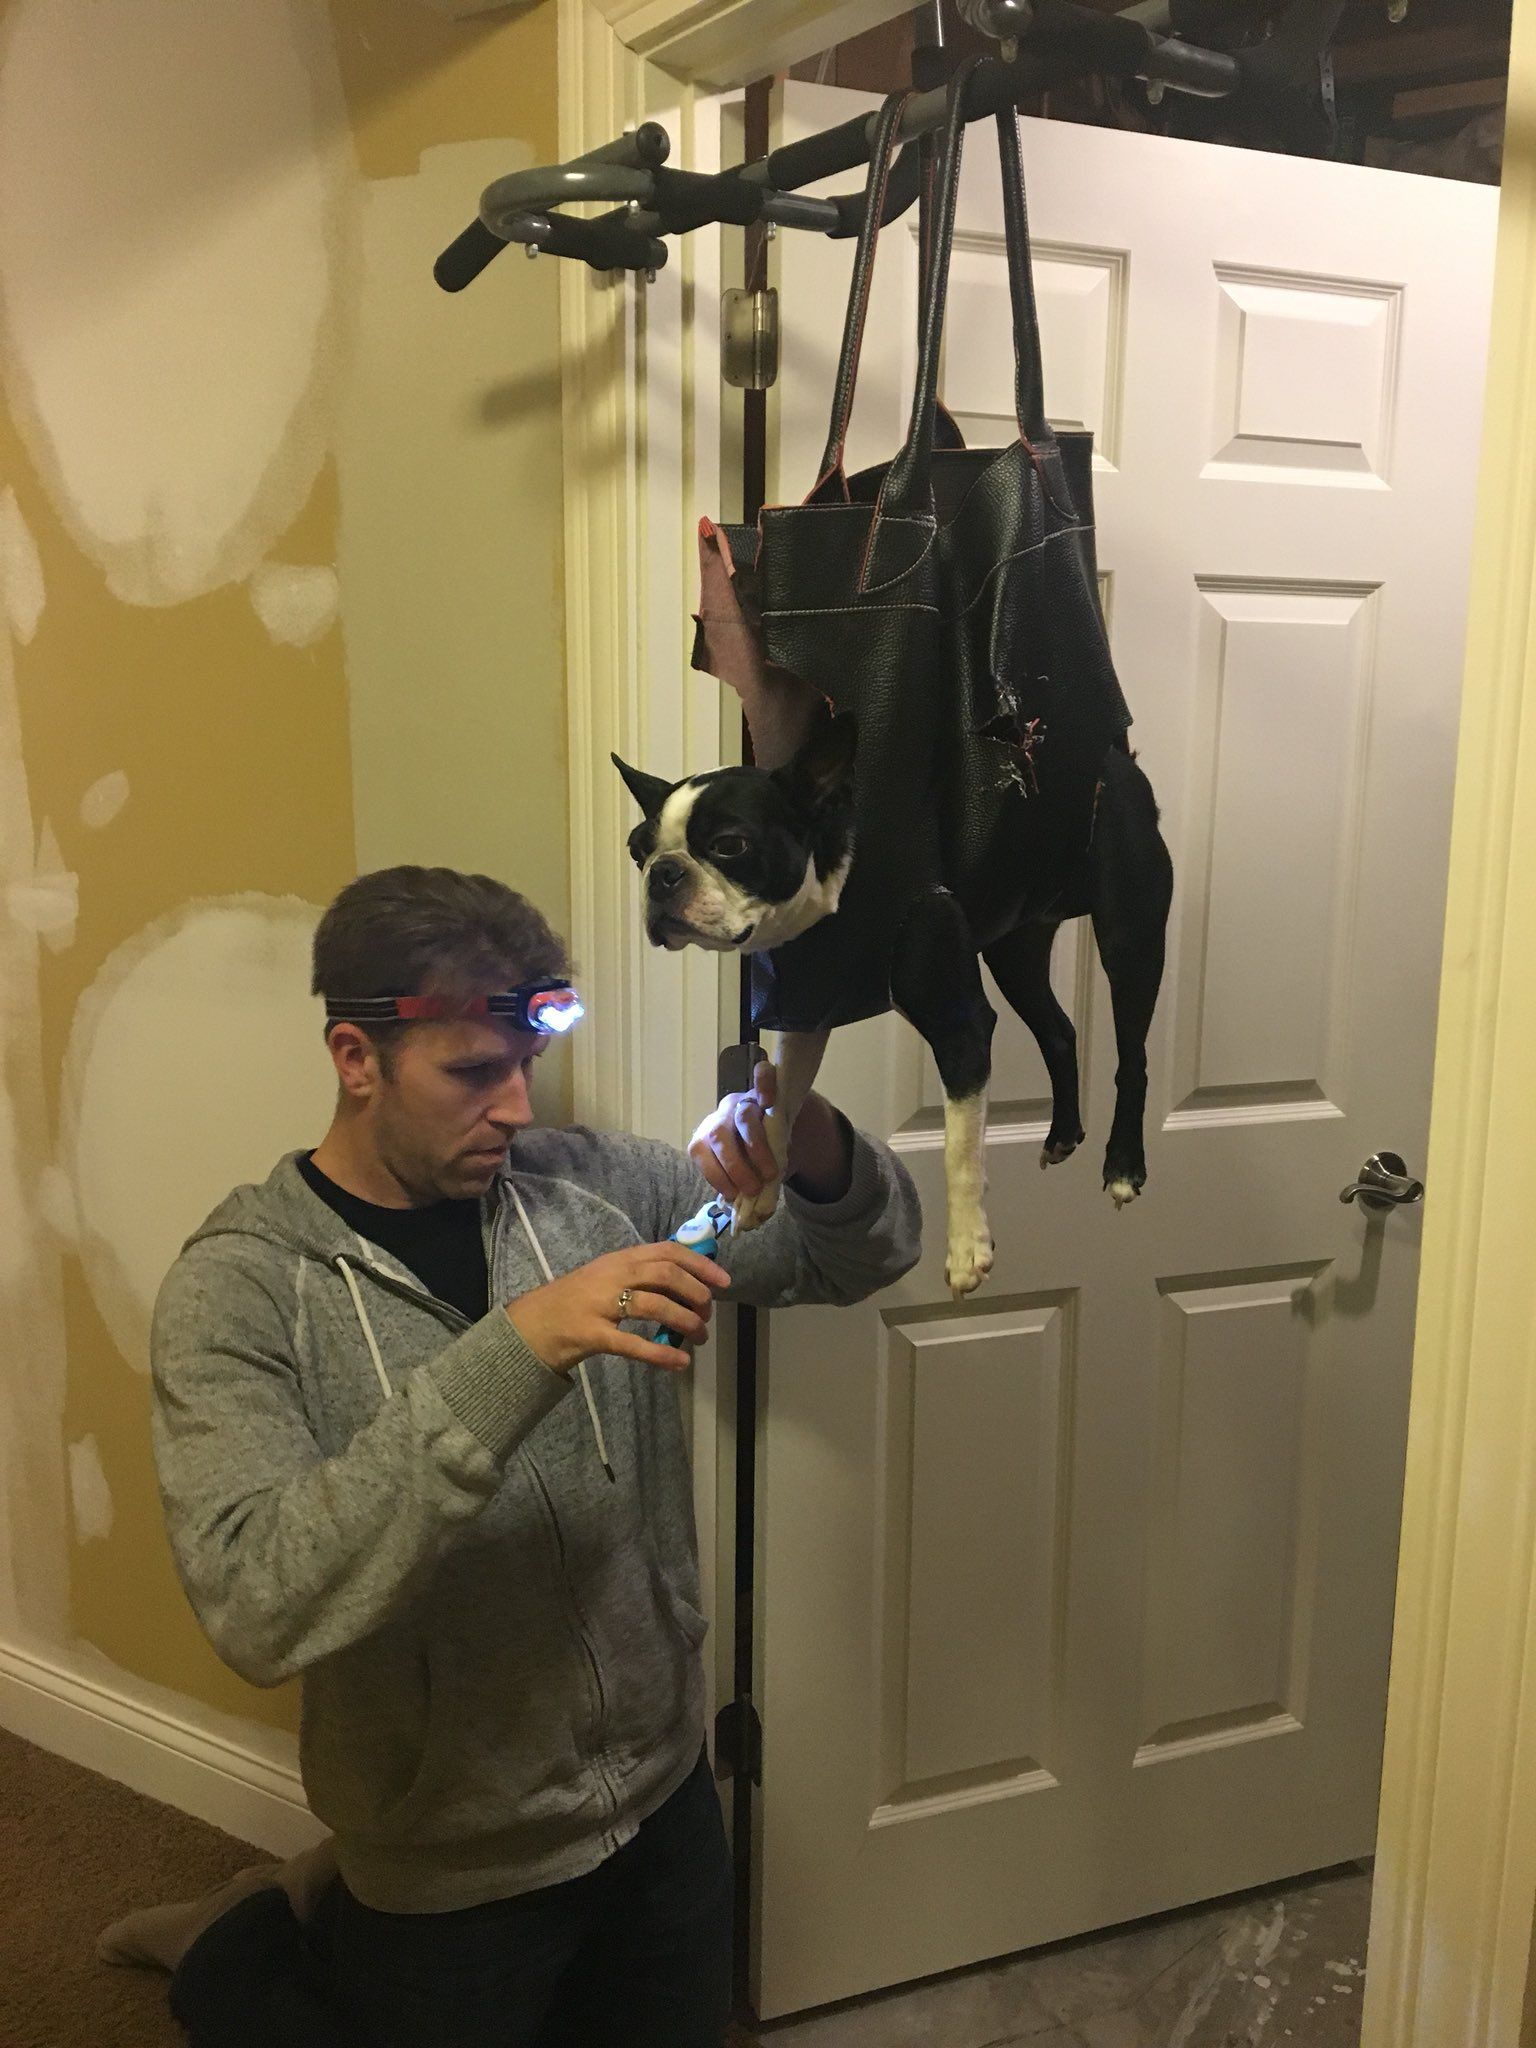 Lol brilliant a boston terrier that hates getting its